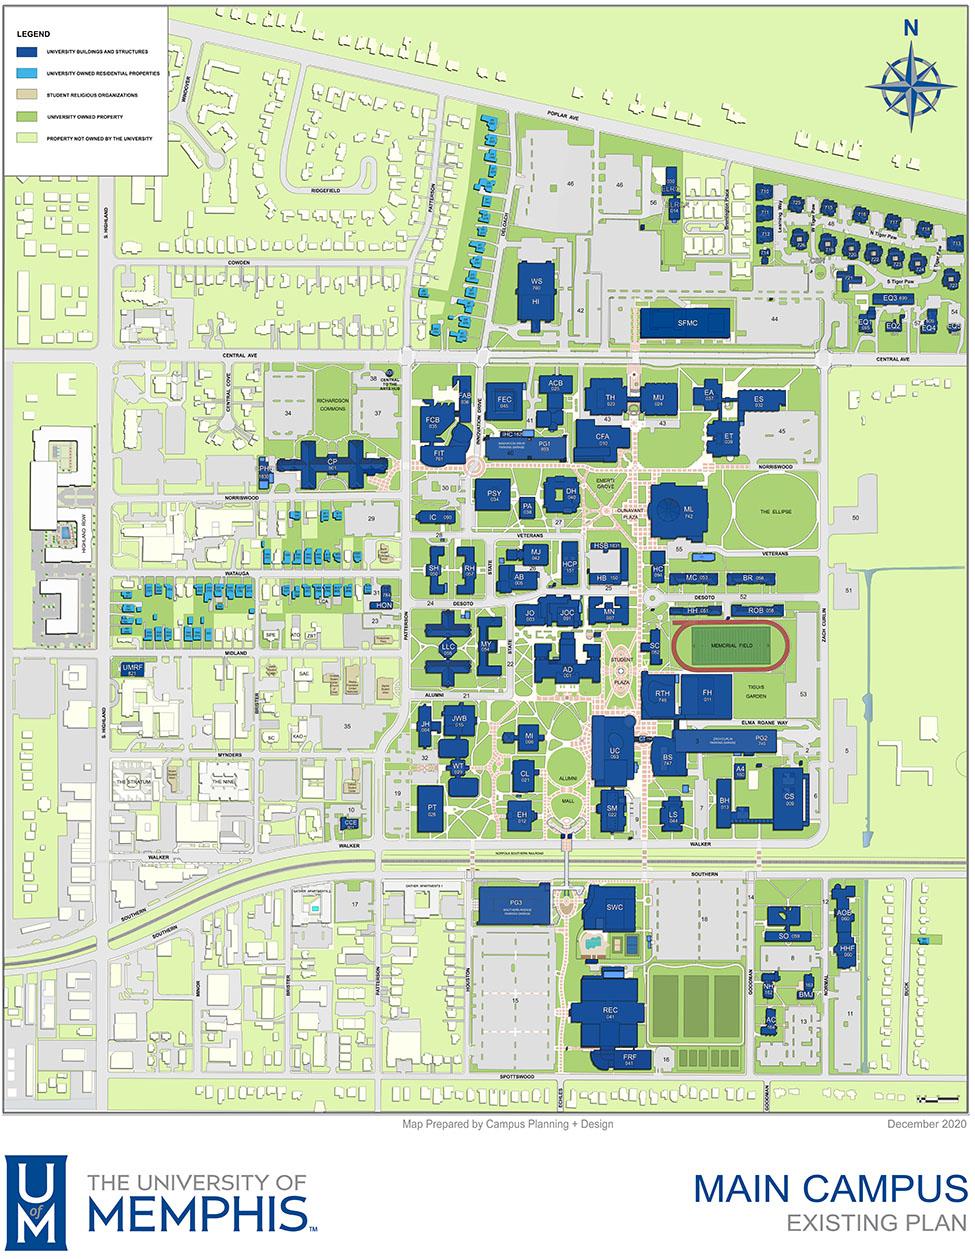 The University of Memphis Main Campus Map